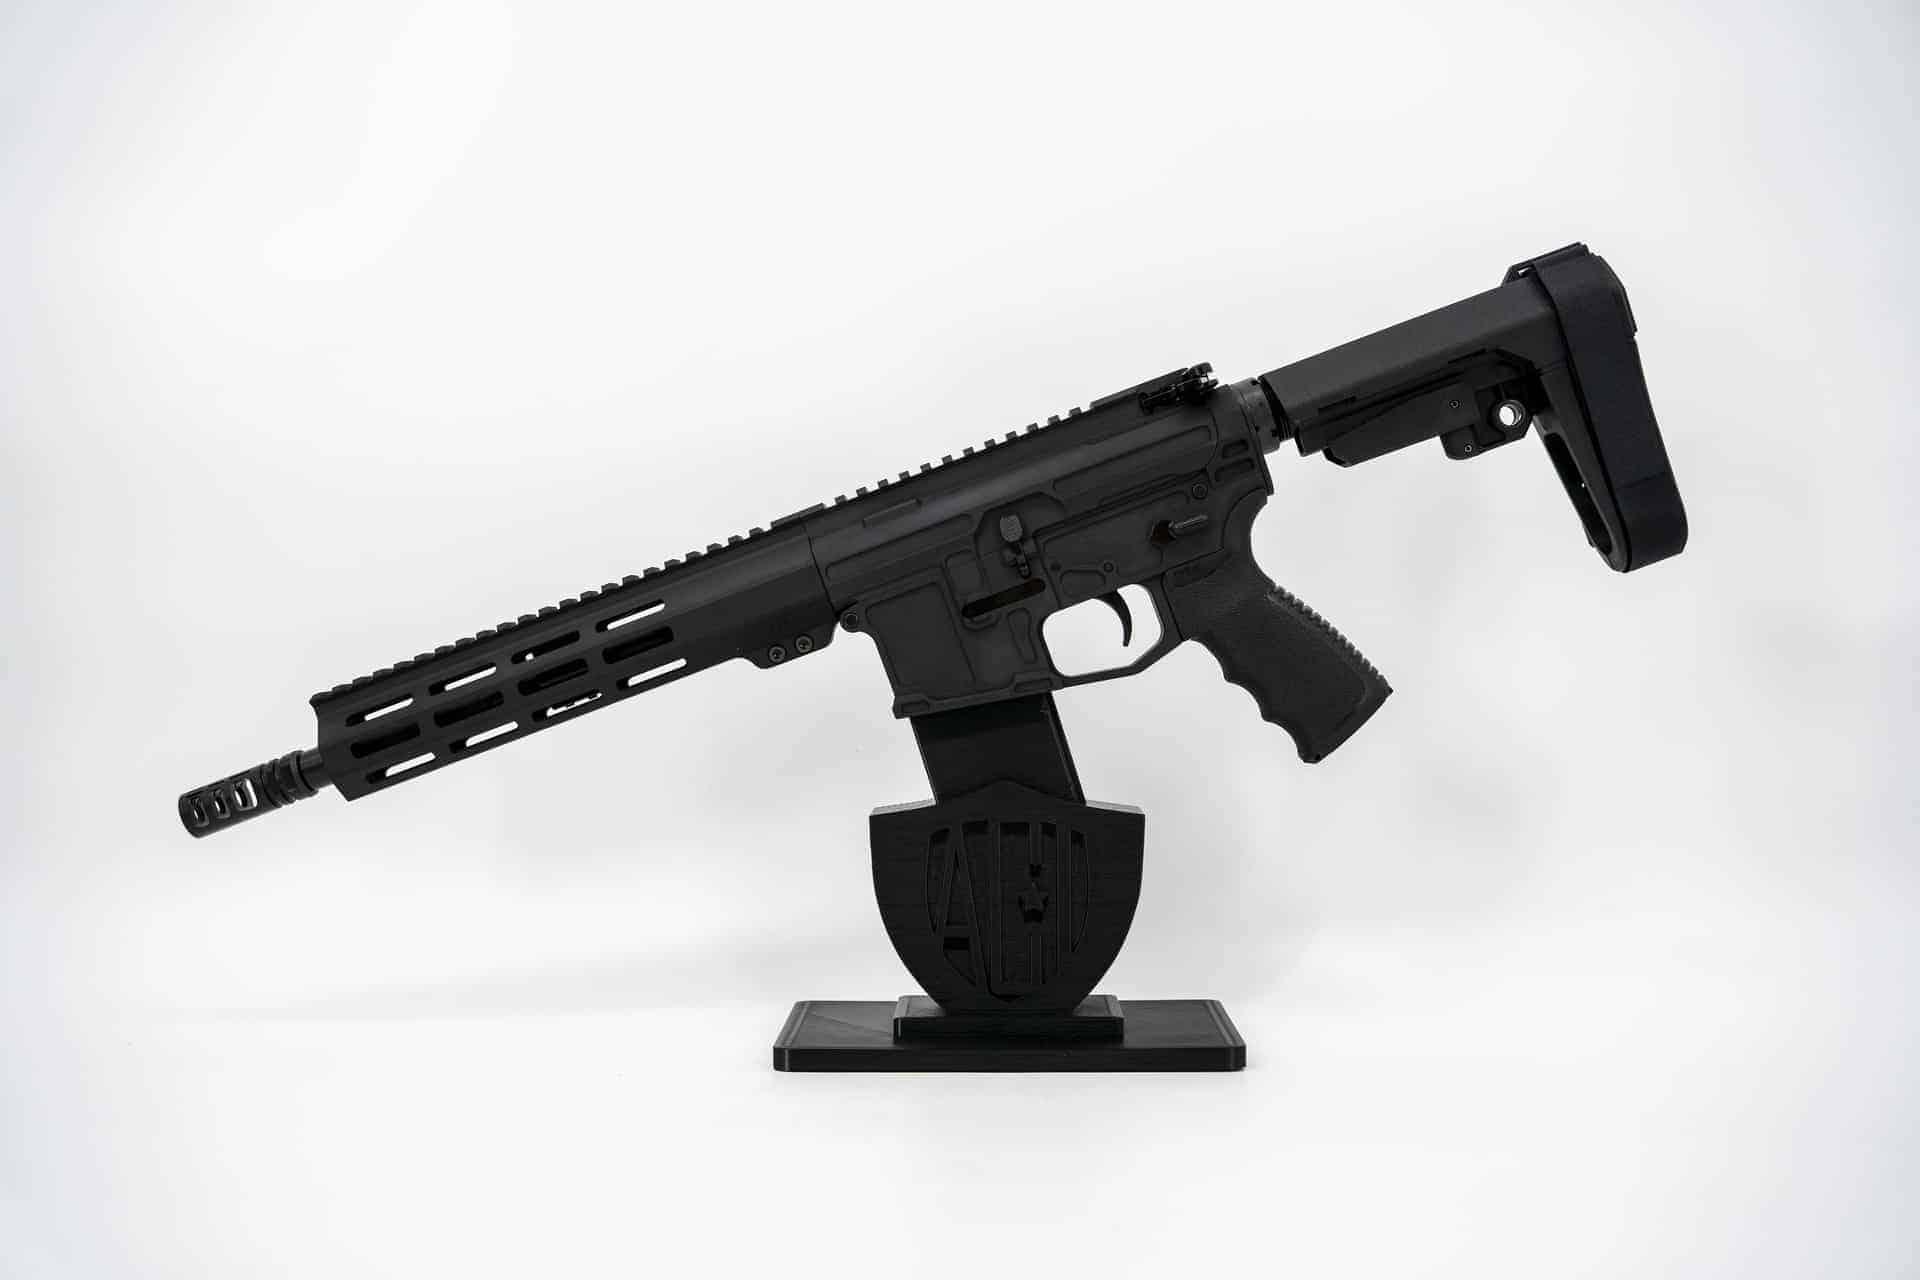 300 blackout ar15 10.5 inch MLOK SBA3 Andro Corp AR15 Pistol